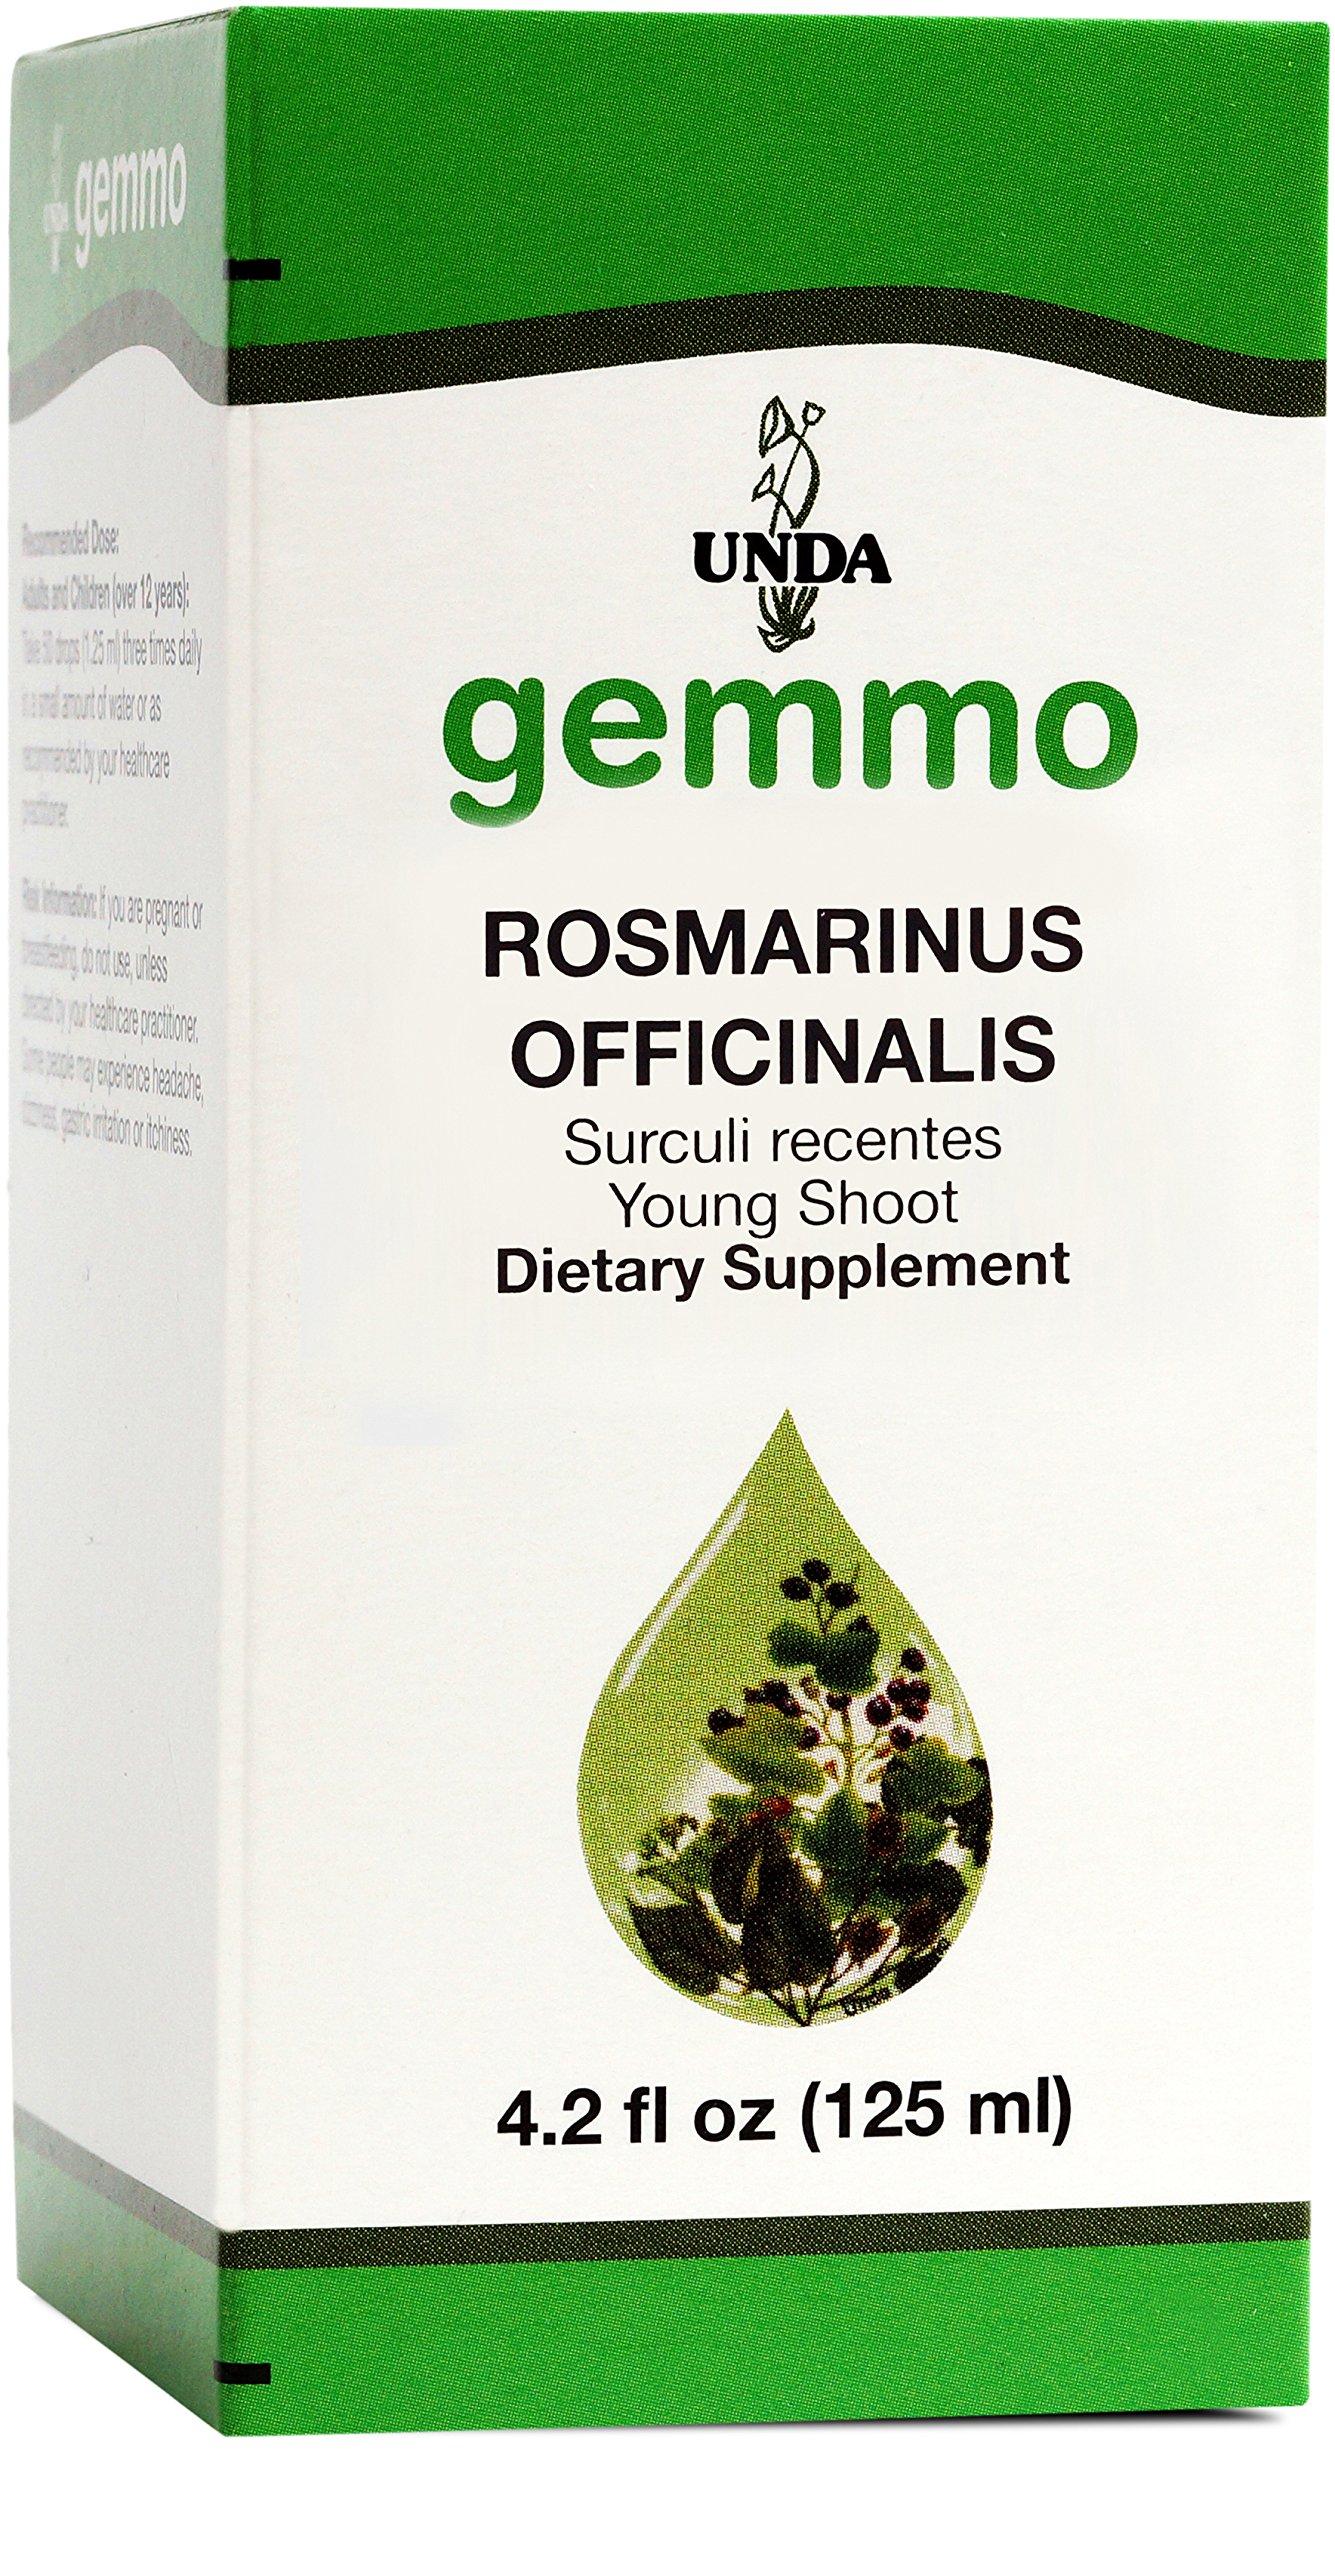 UNDA Gemmo Therapy - Rosmarinus Officinalis - Rosemary Young Shoot Extract - 4.2 fl oz (125 ml)